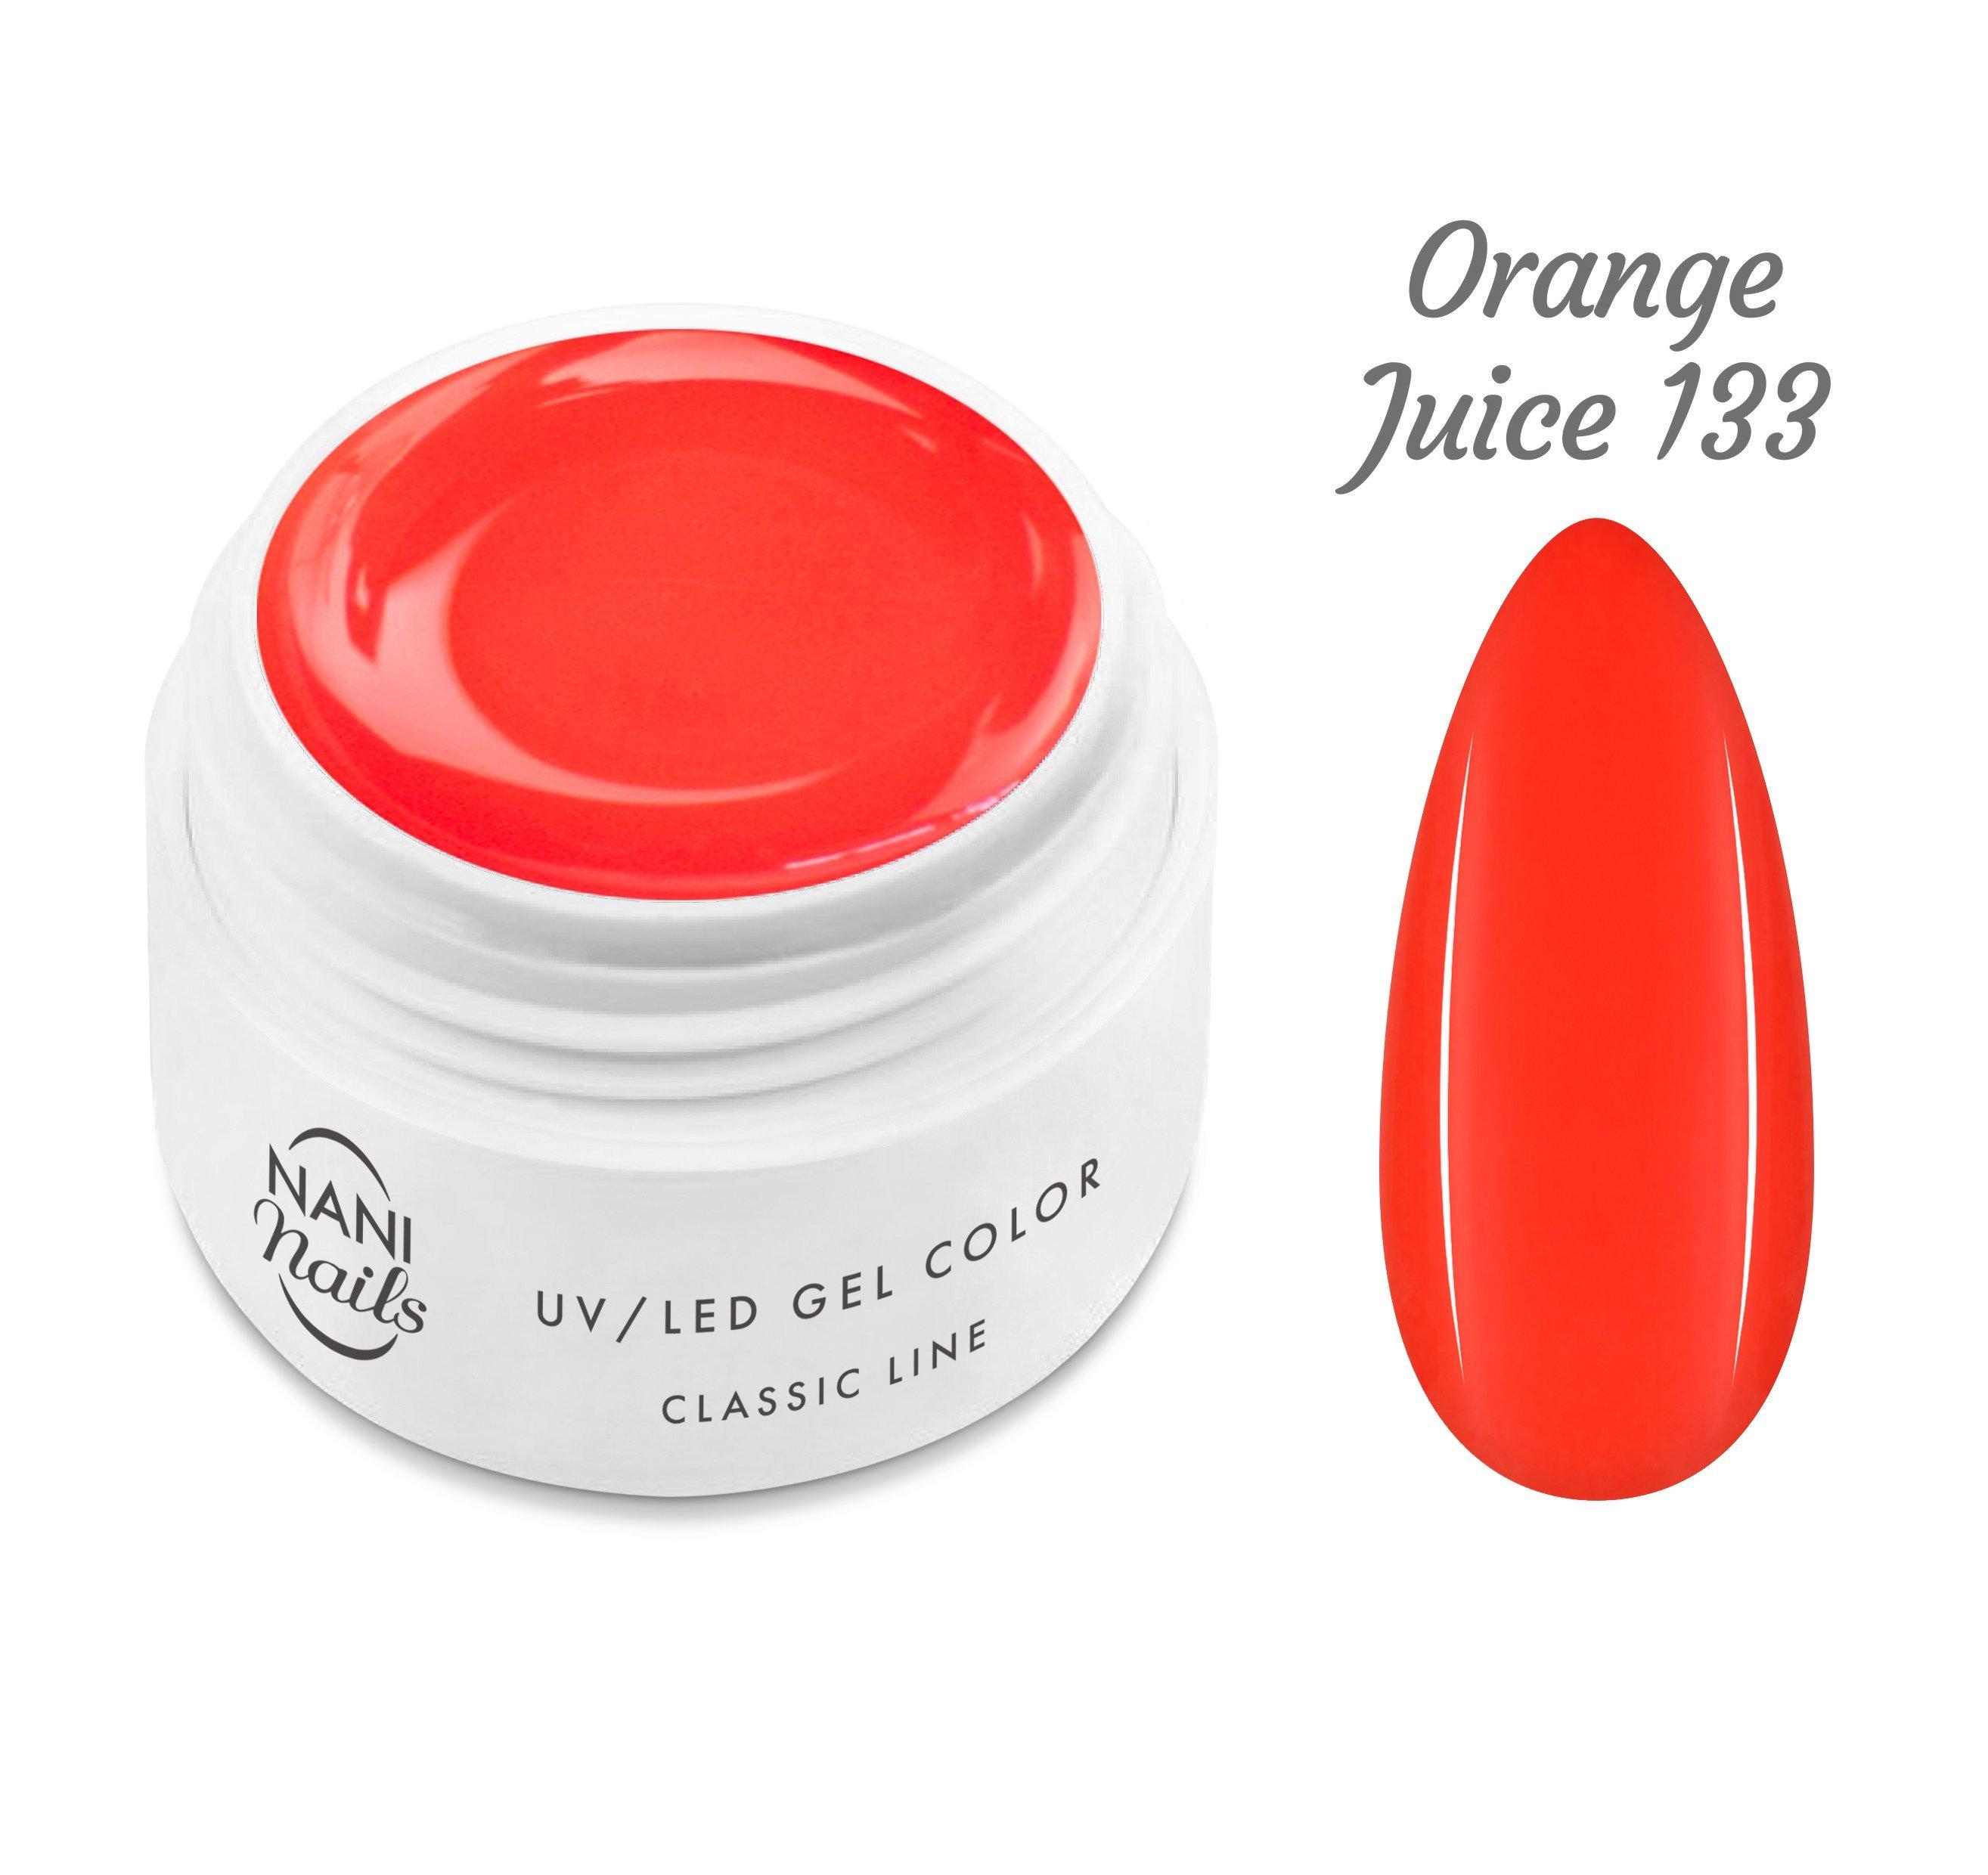 NANI UV gél Classic Neon Line 5 ml - Orange Juice